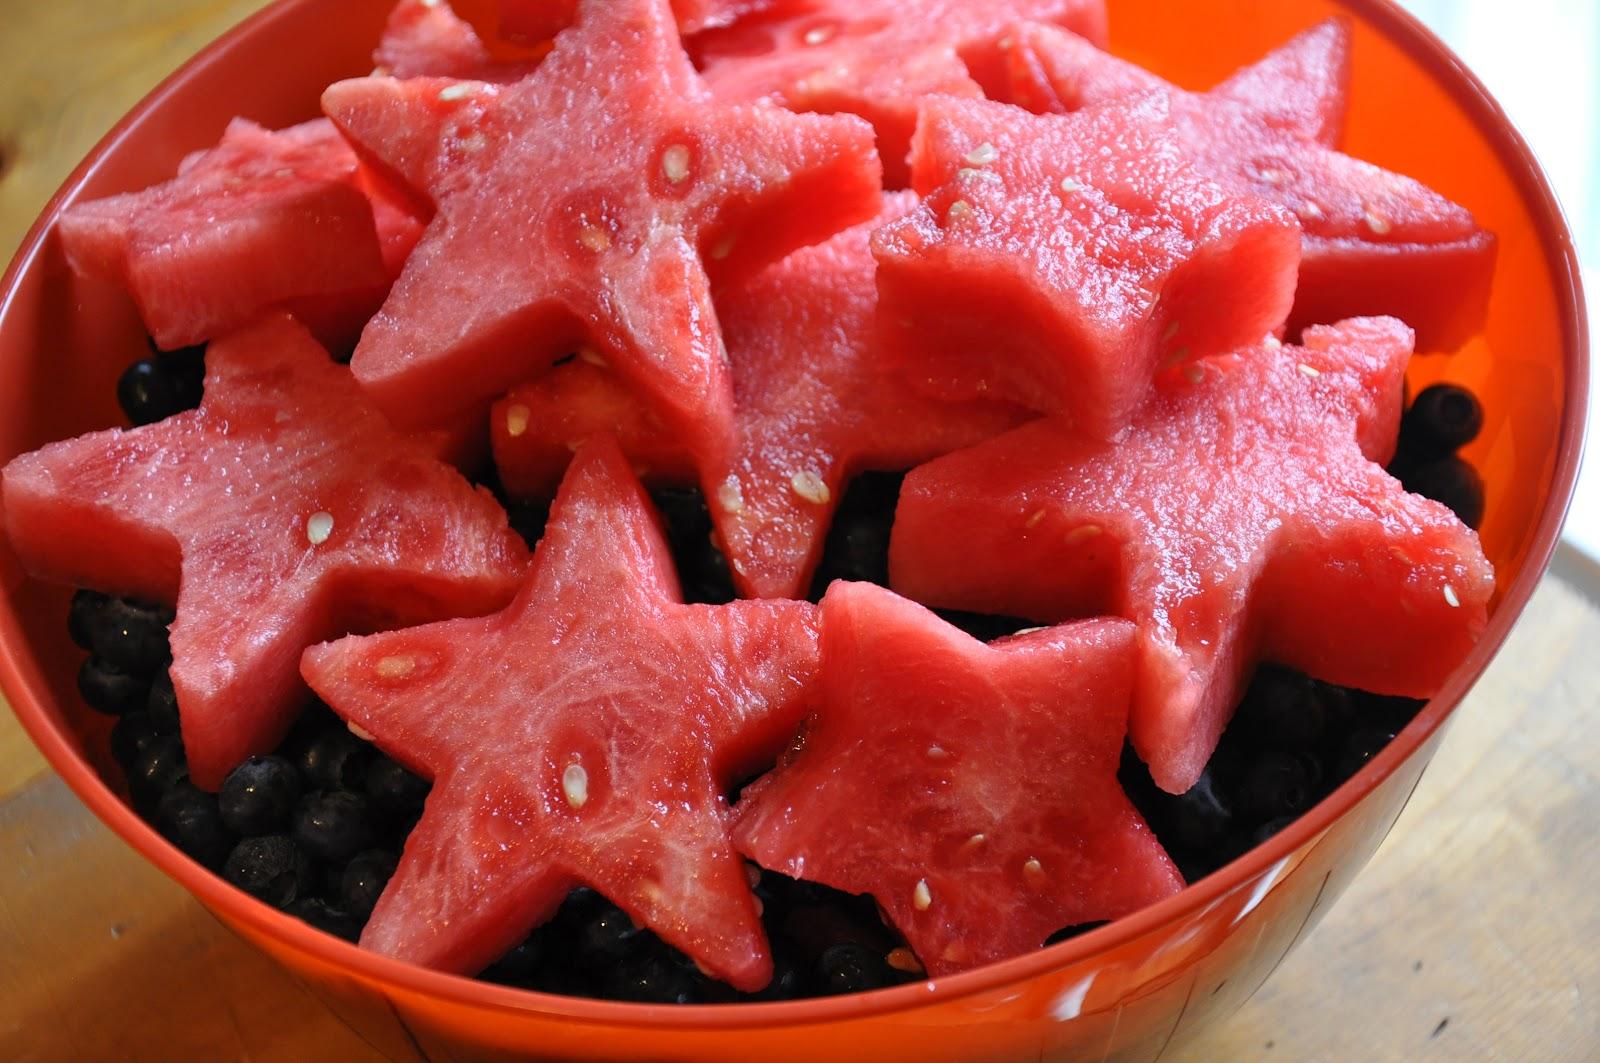 Watermelon Stars over Blueberries